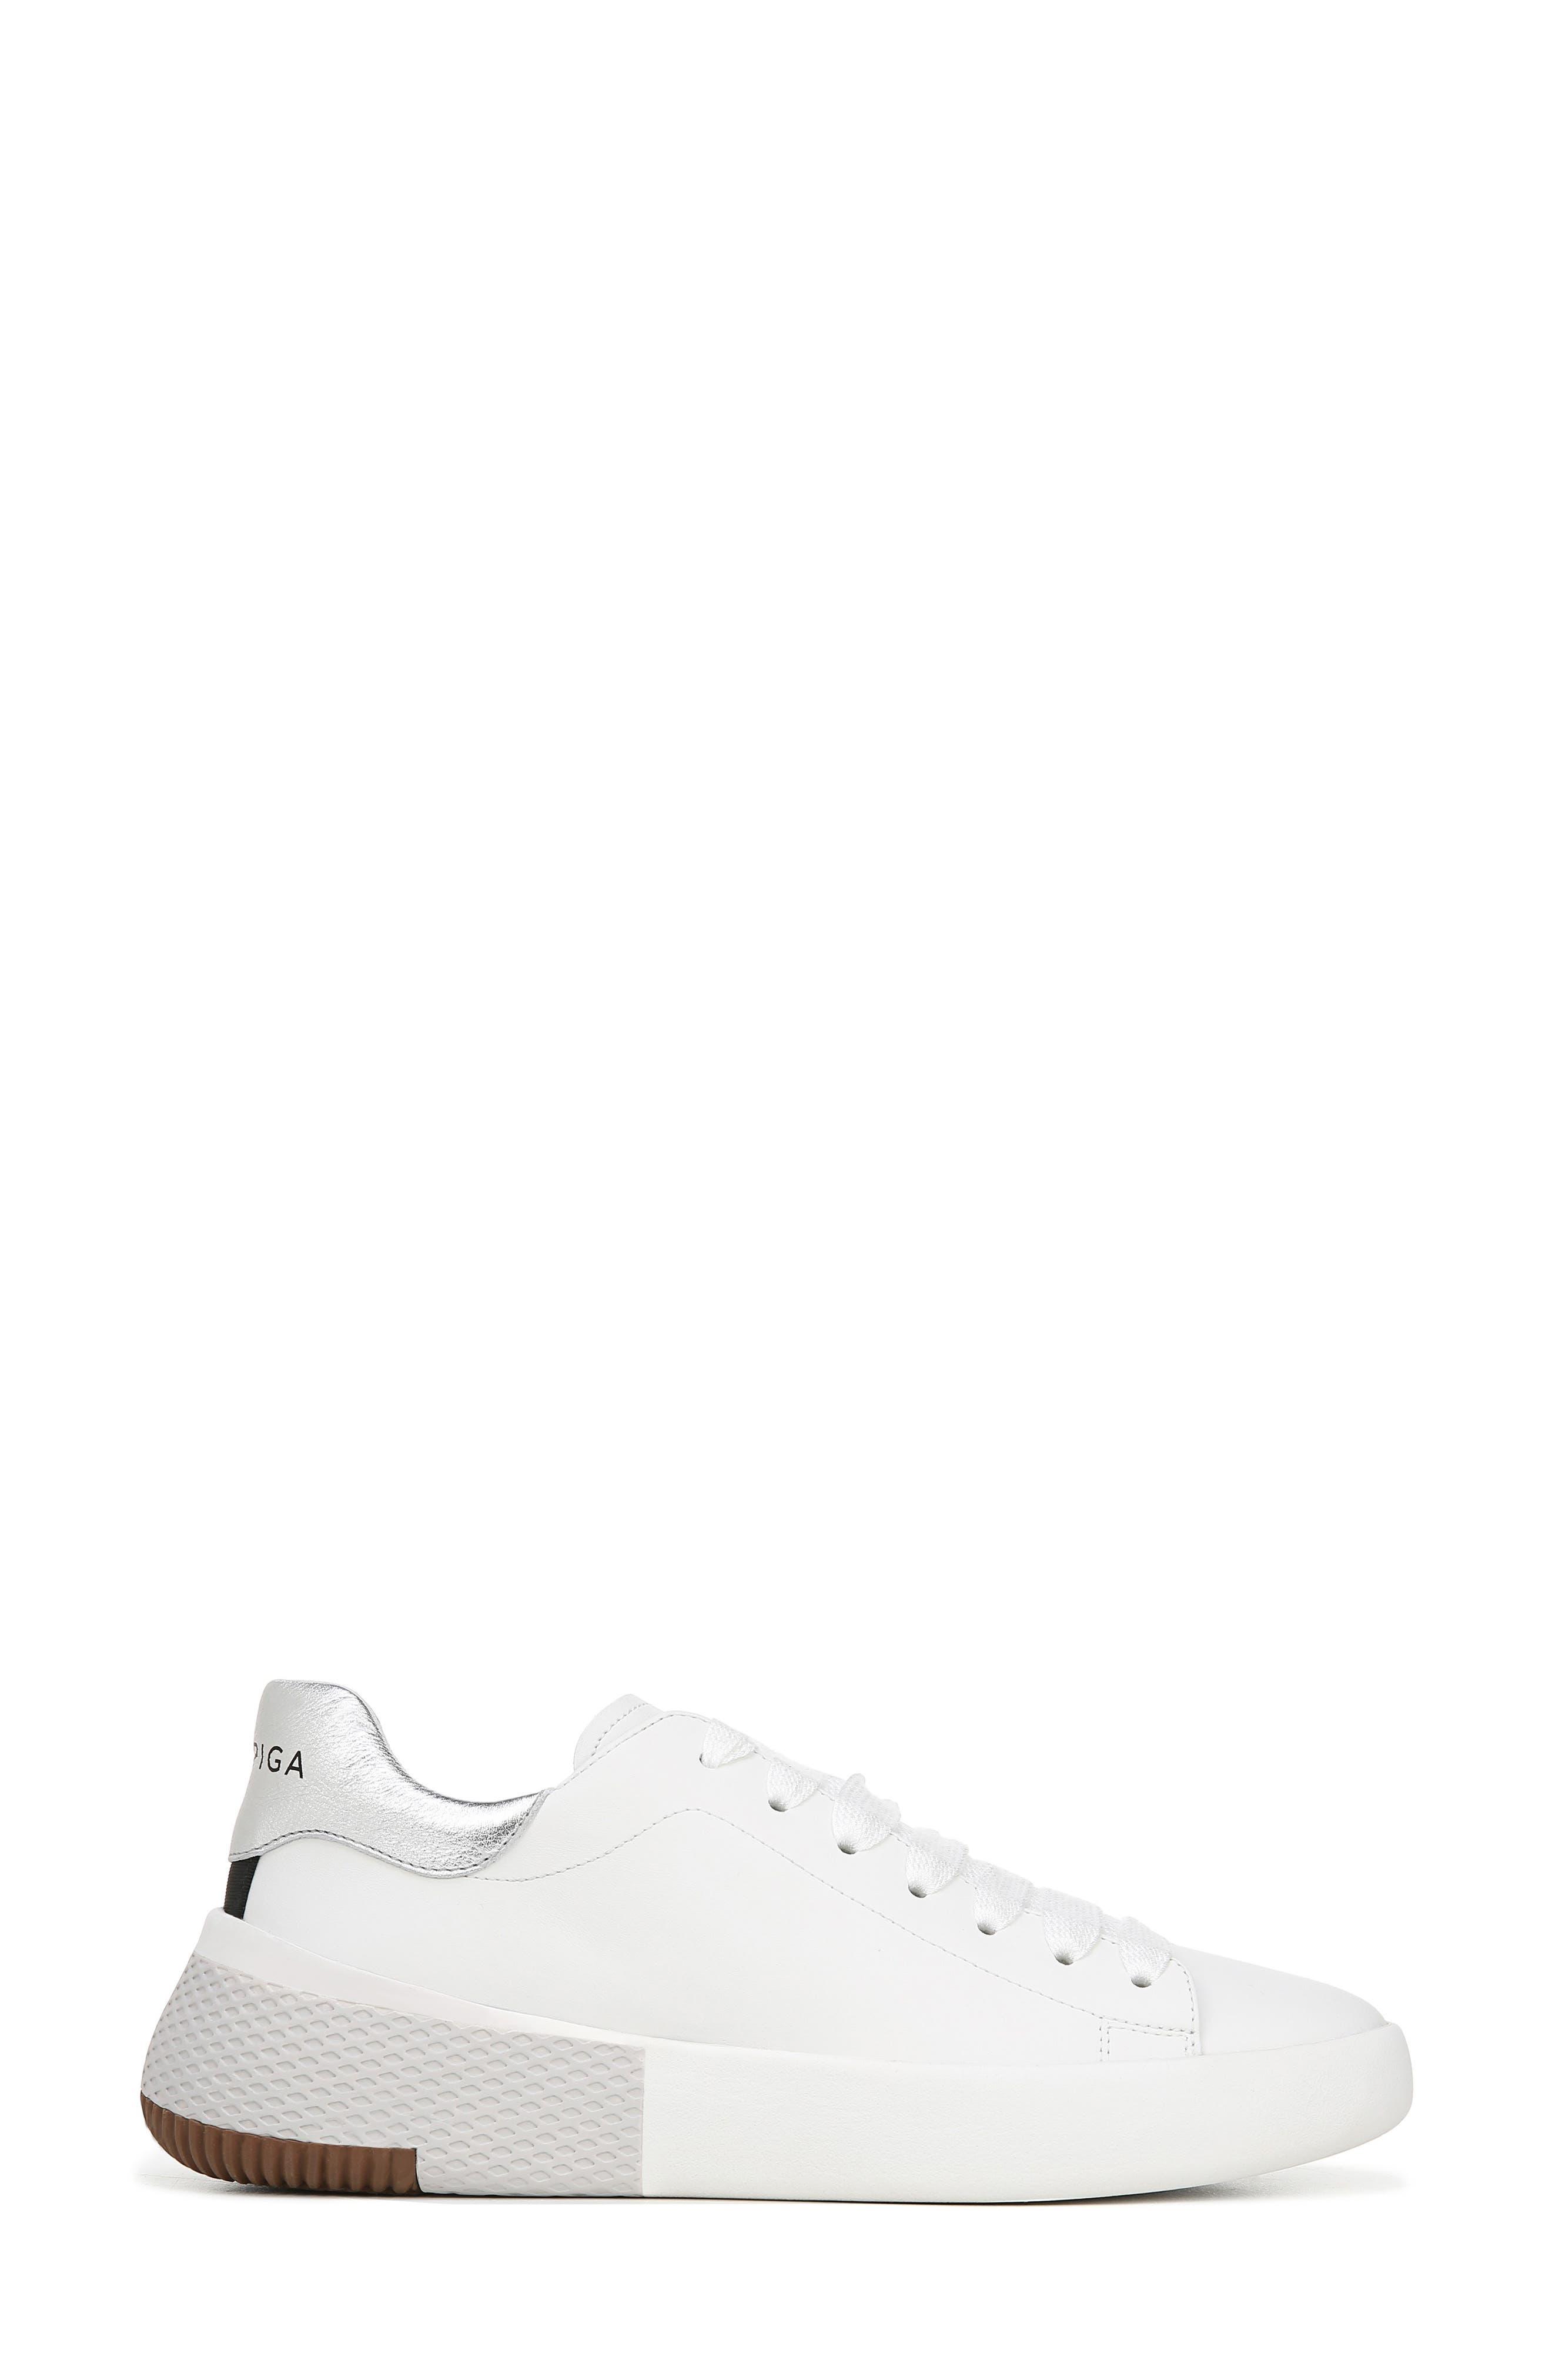 VIA SPIGA, Parrel Sneaker, Alternate thumbnail 3, color, PORCELAIN/ SILVER